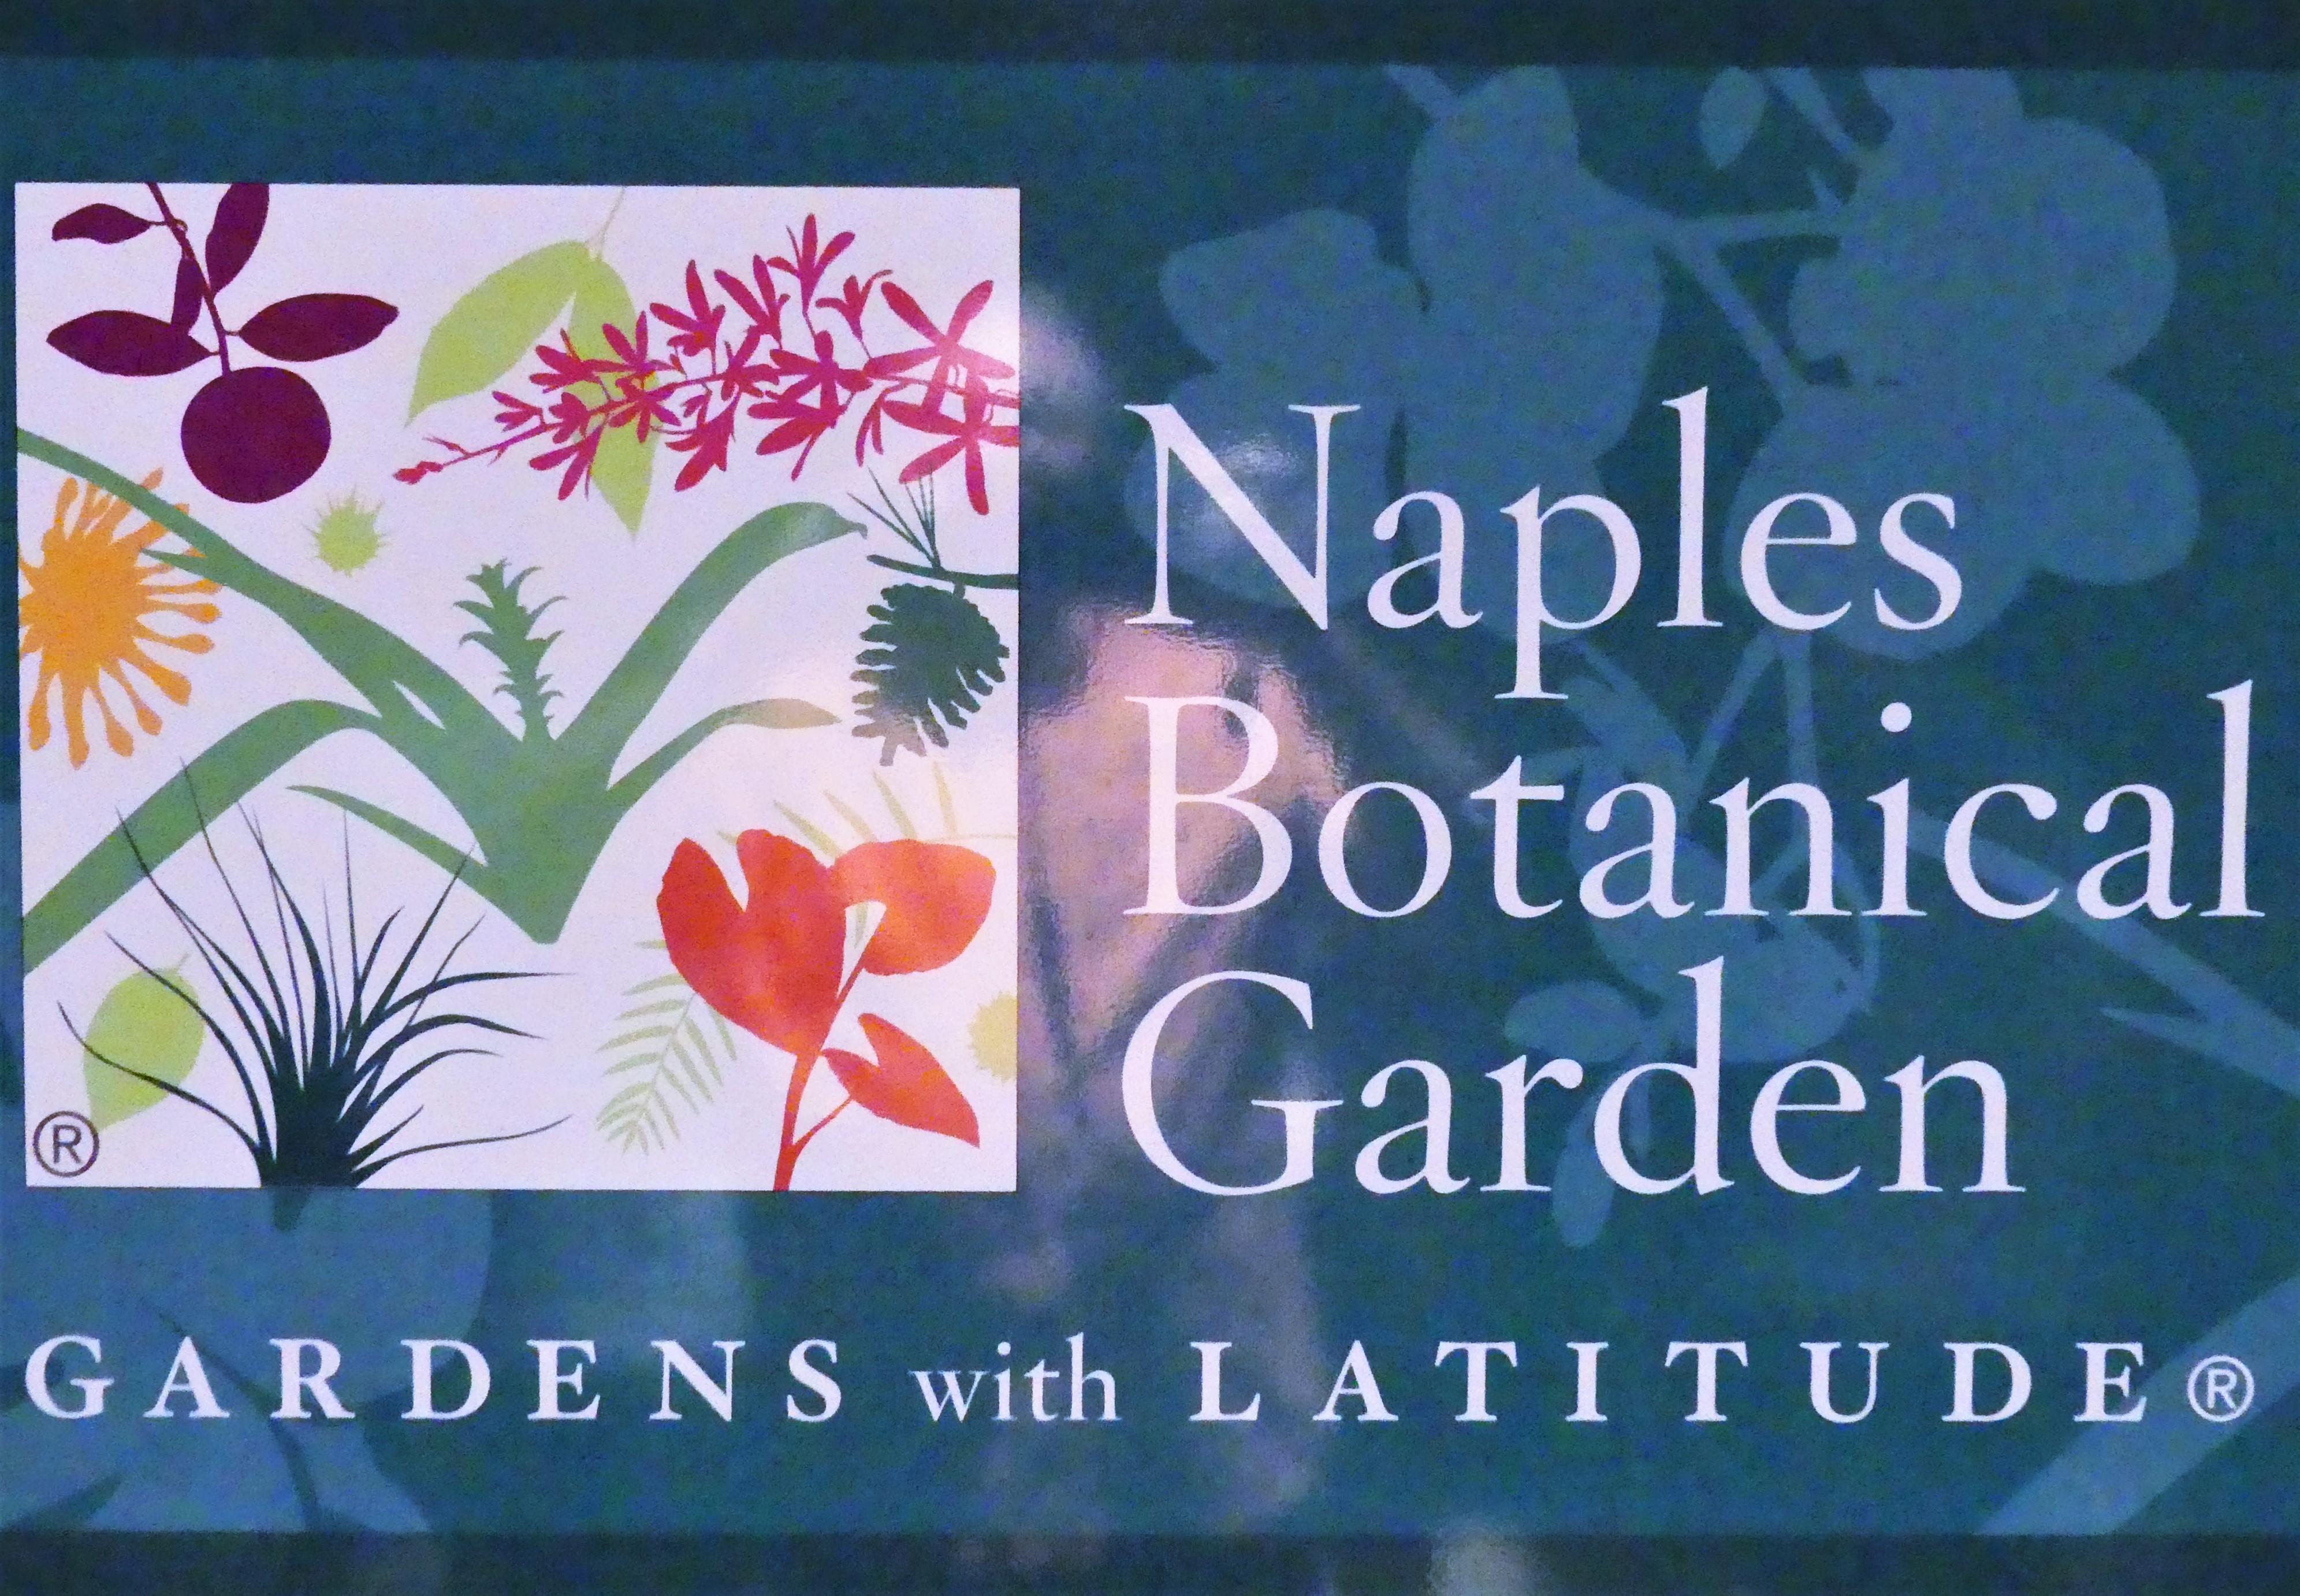 Gardens with Latitude